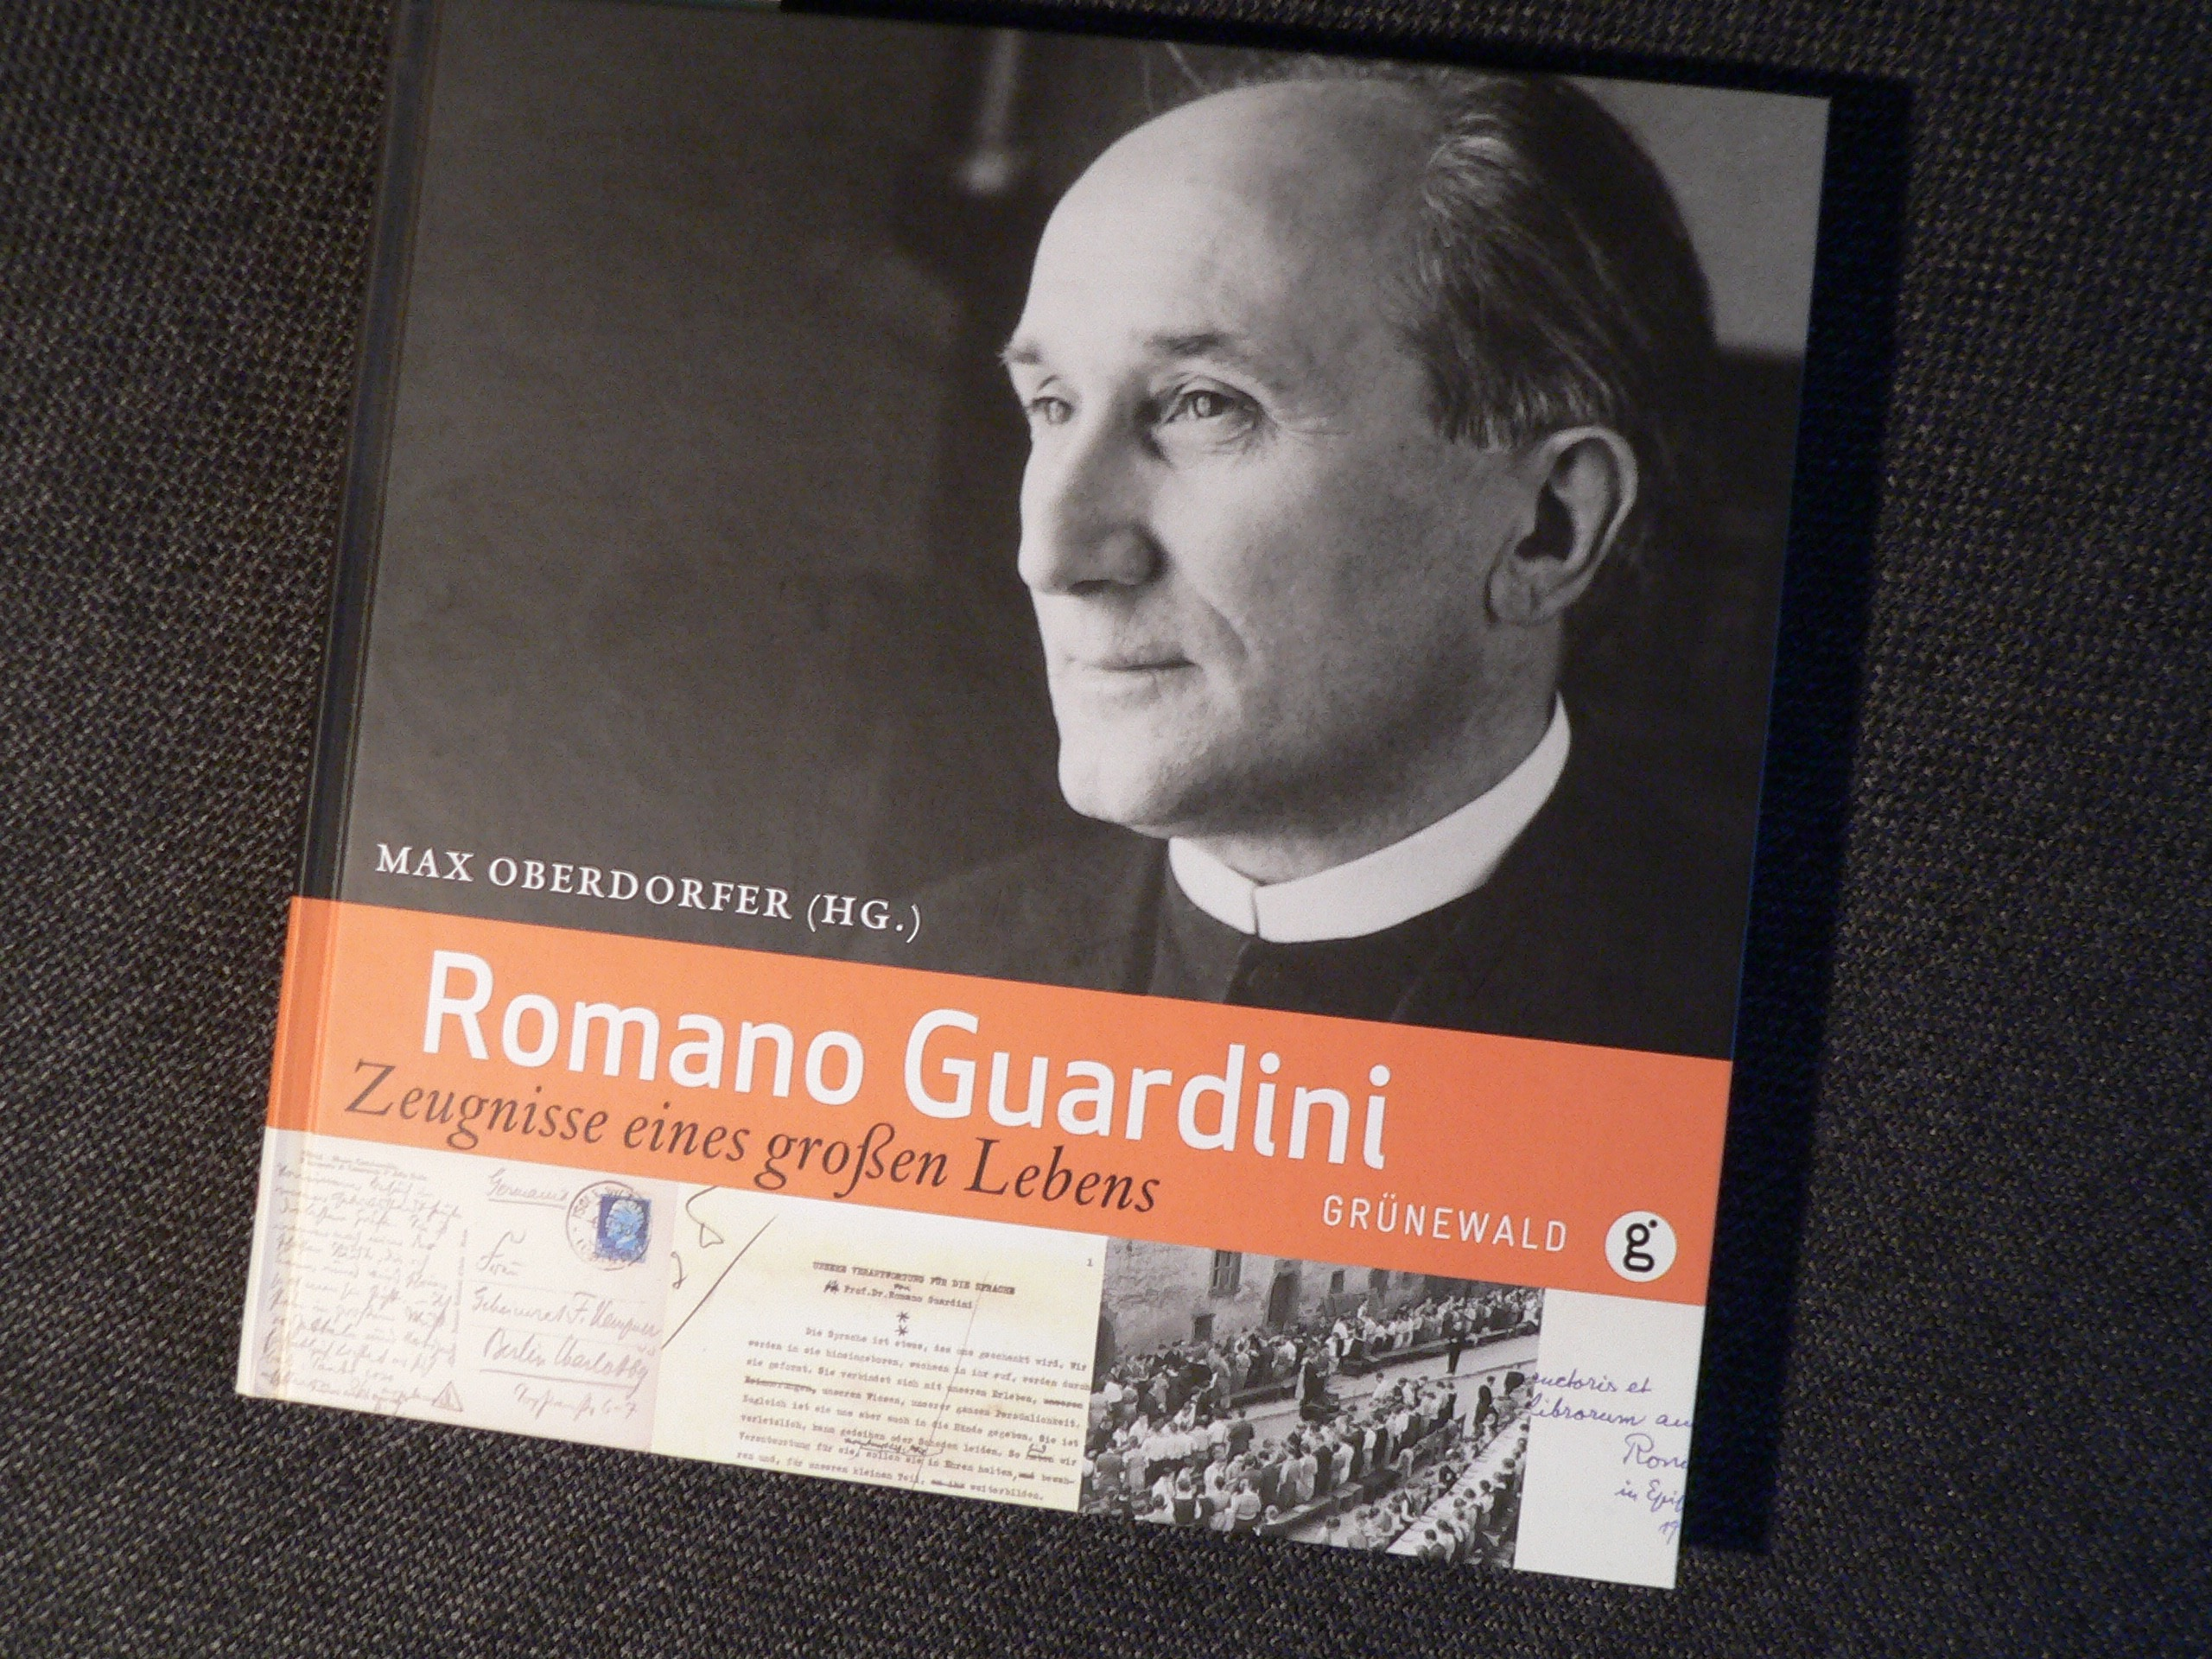 Guardini-Vita mit vielen Bildern | Repro: B. Schneider